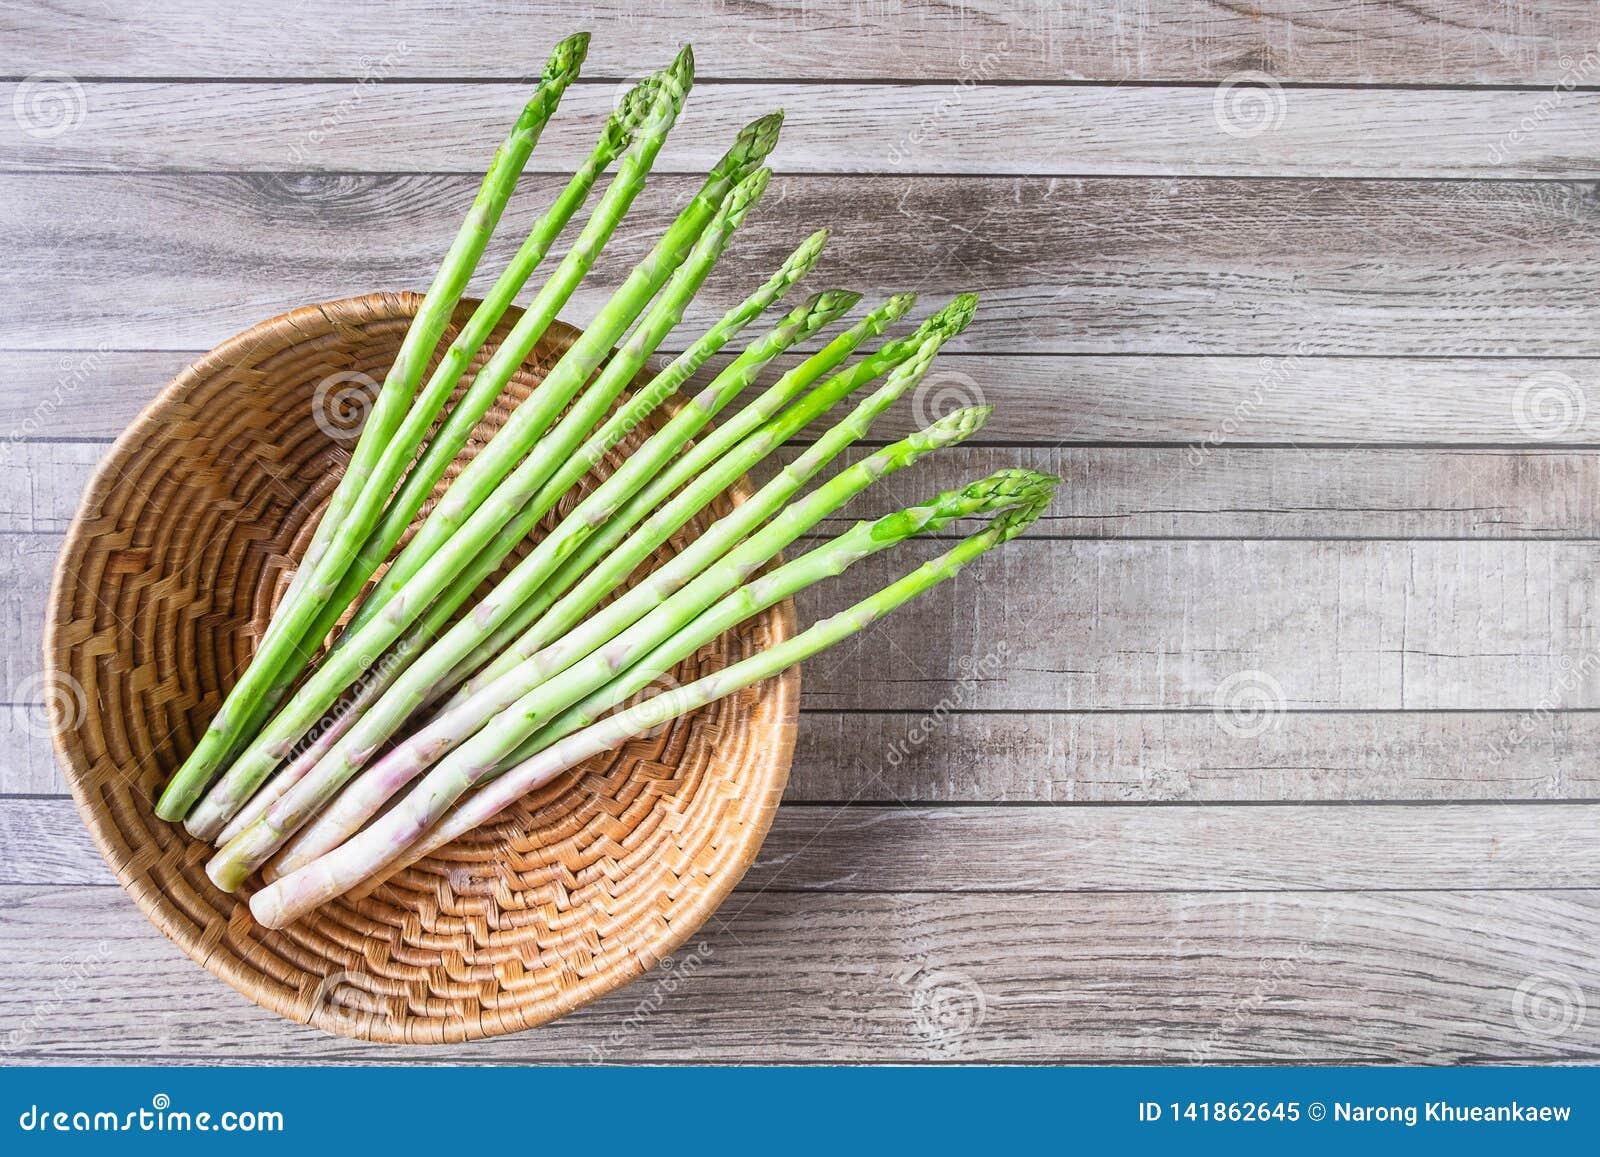 .Asparagus in a basket on a table